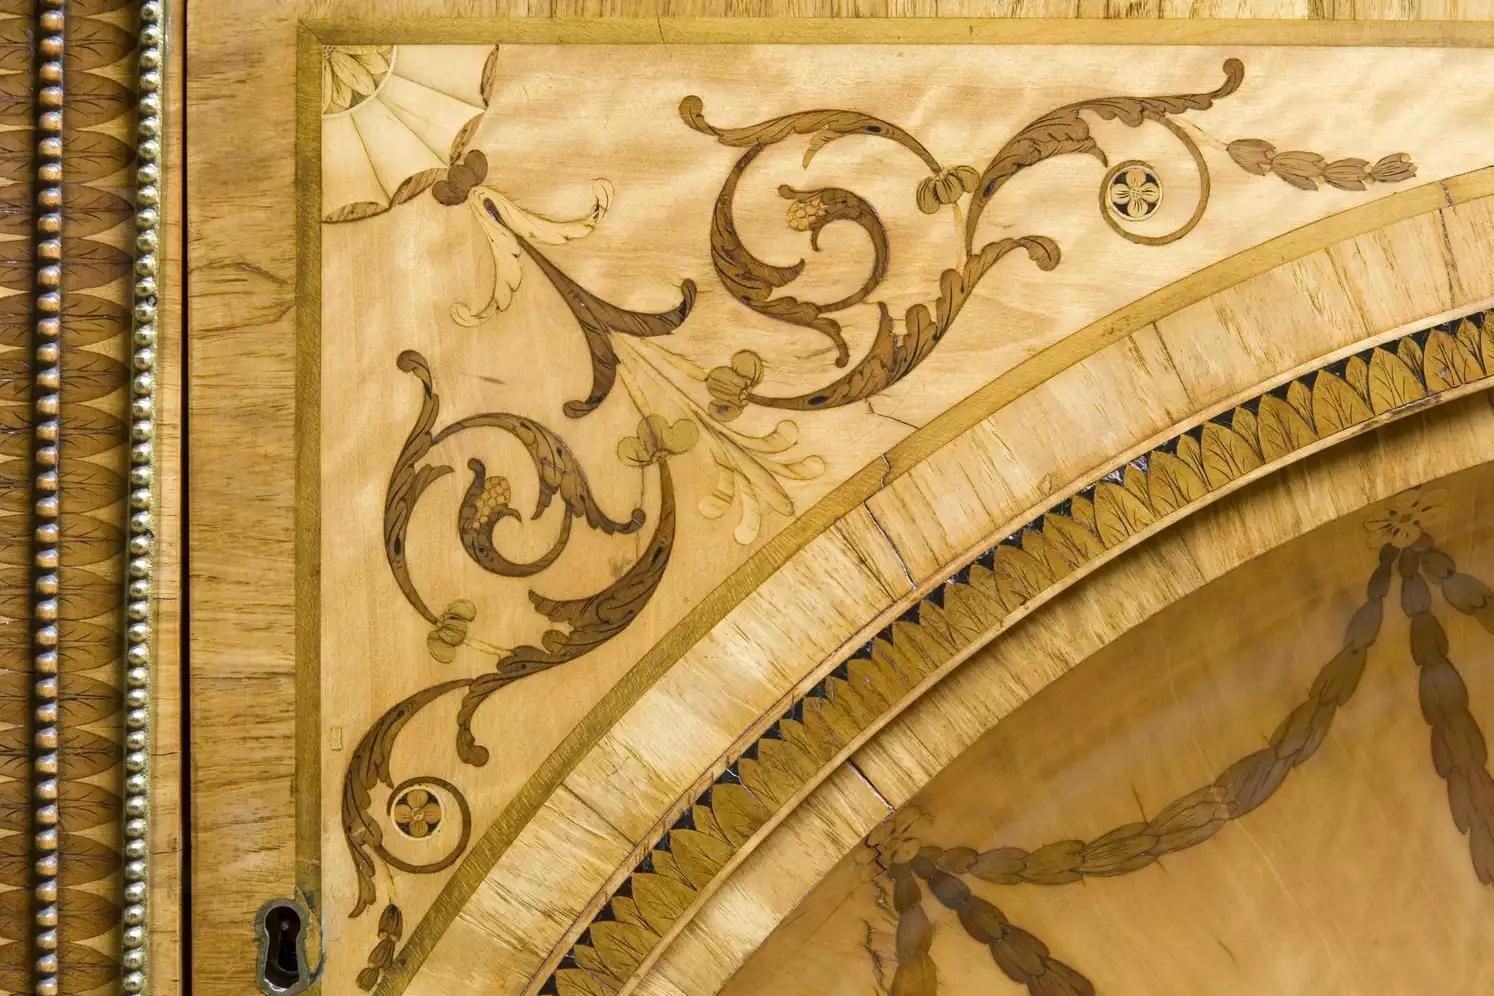 Sejarah Mengenai Gaya Arsitektur Recoco